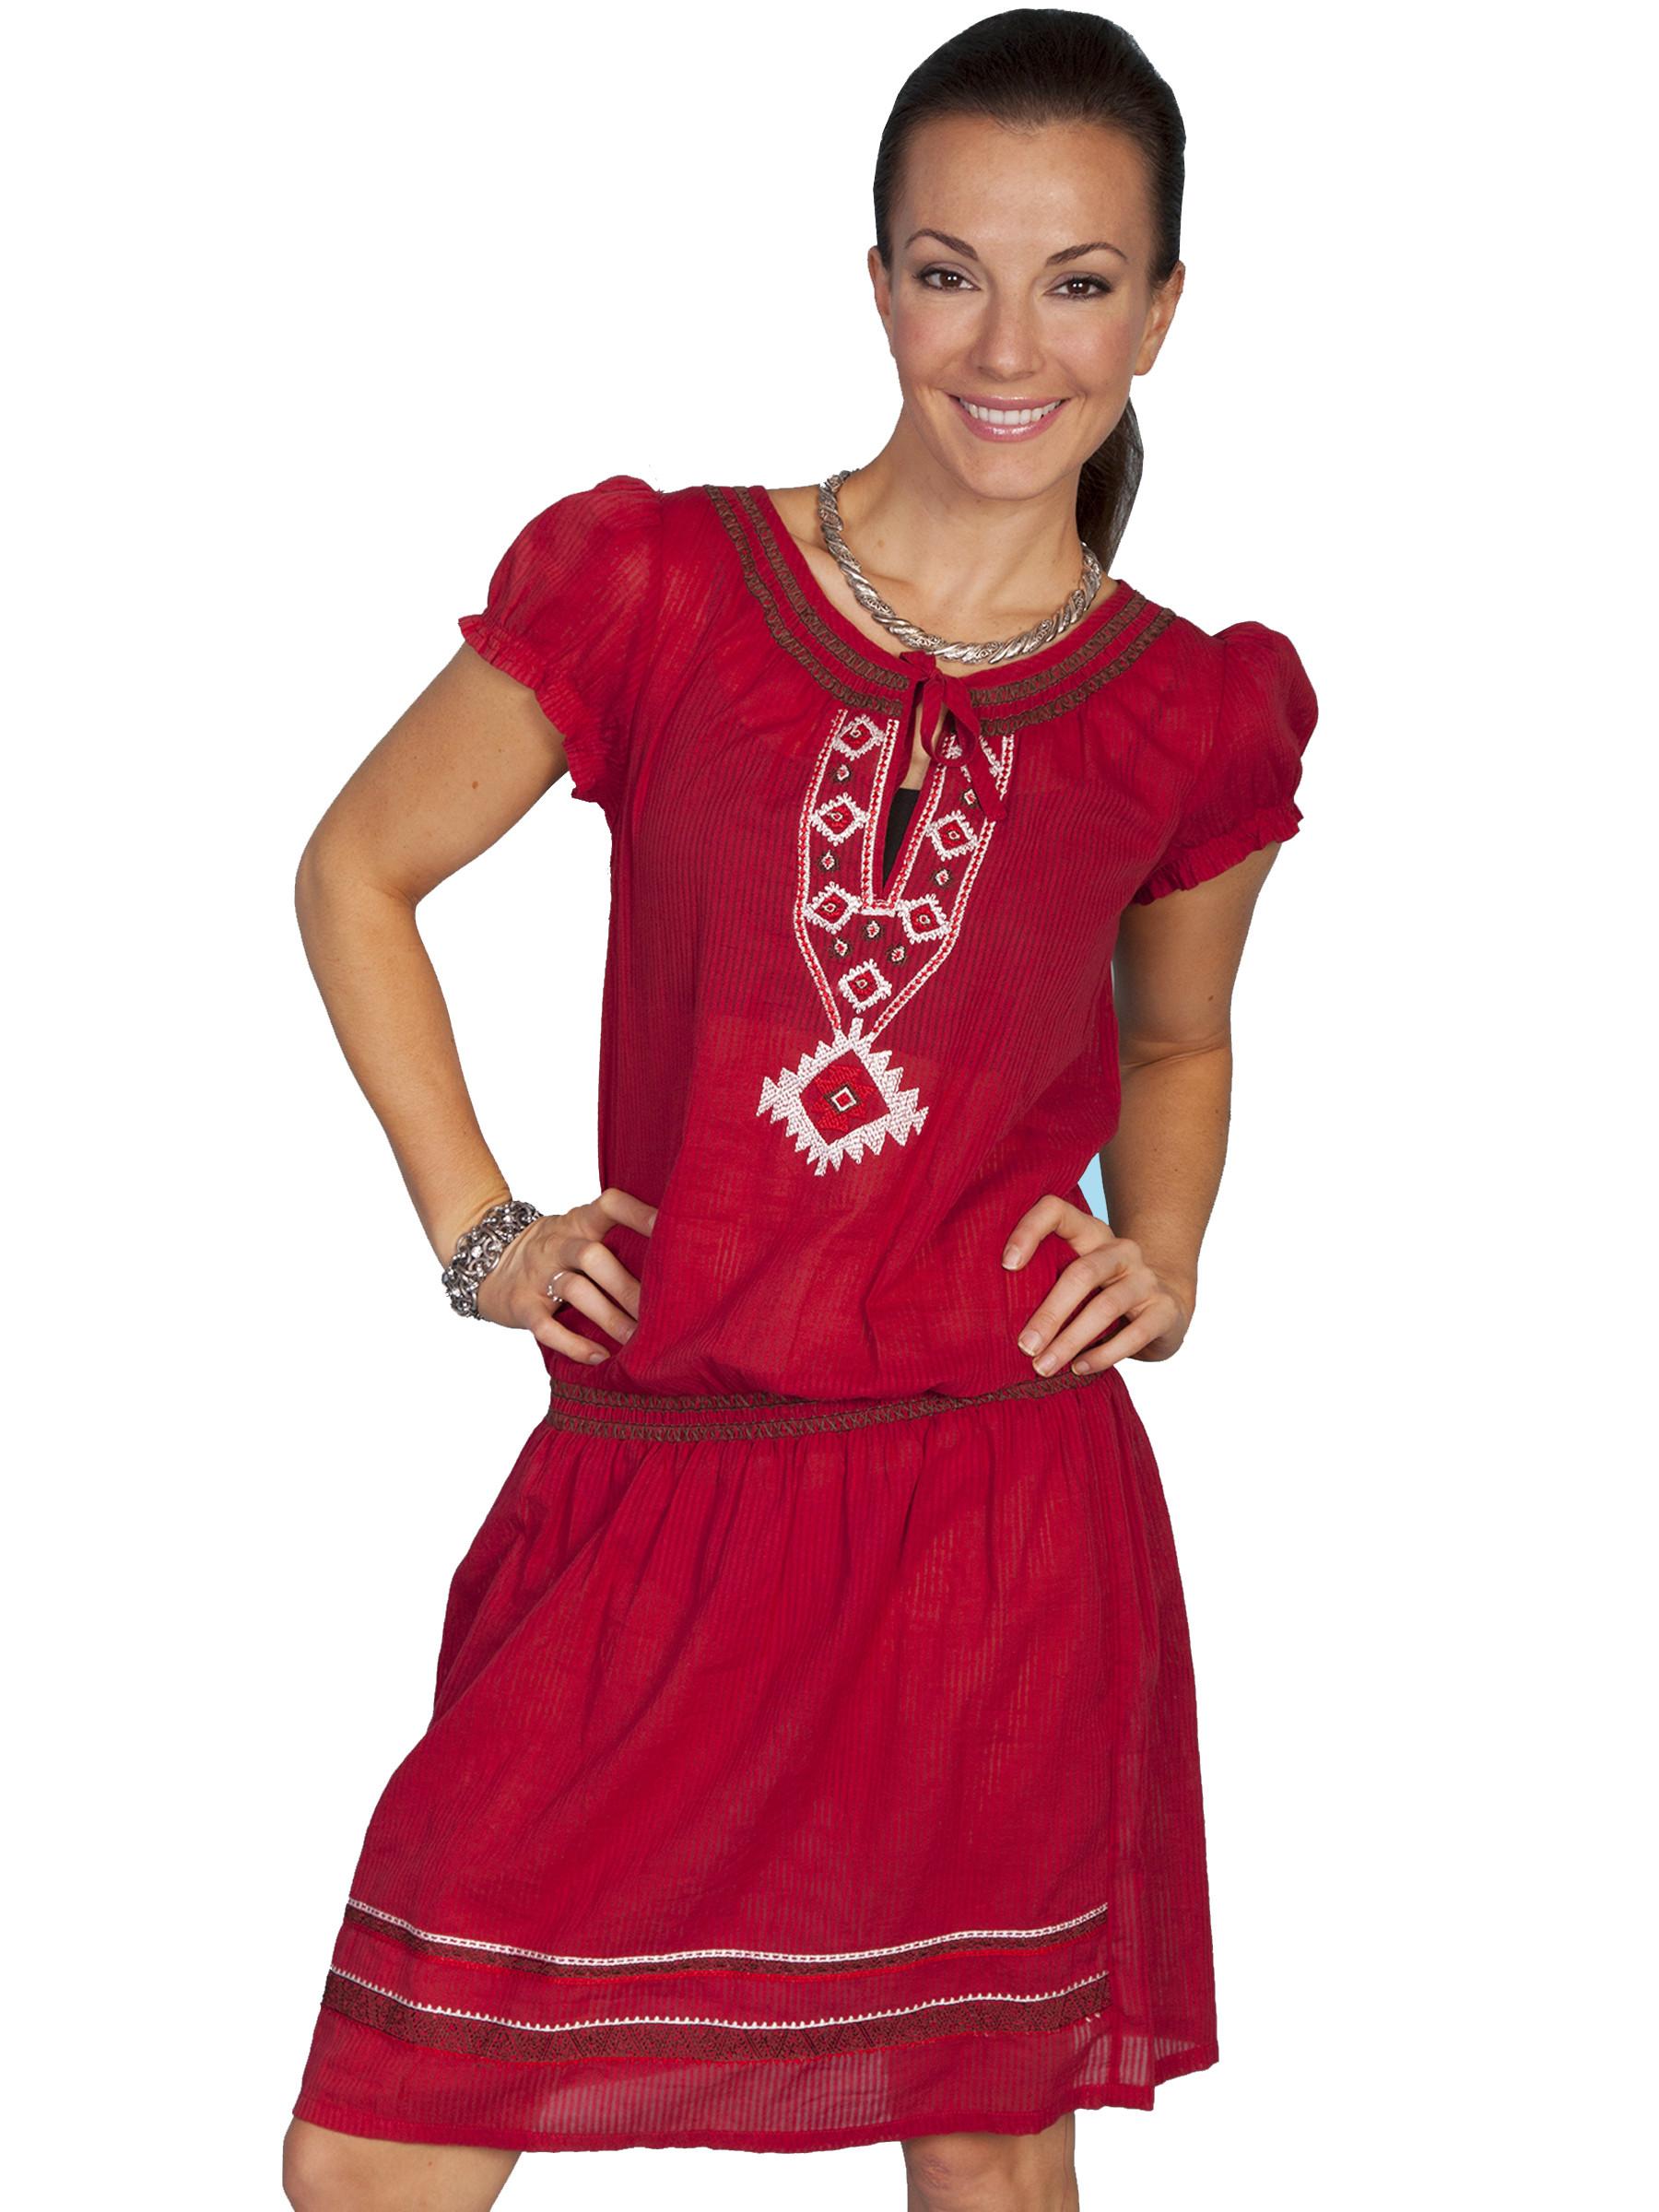 New  Dakota Suzett  Shirt Dress  Shift Dress  Red Plaid Dress  7900